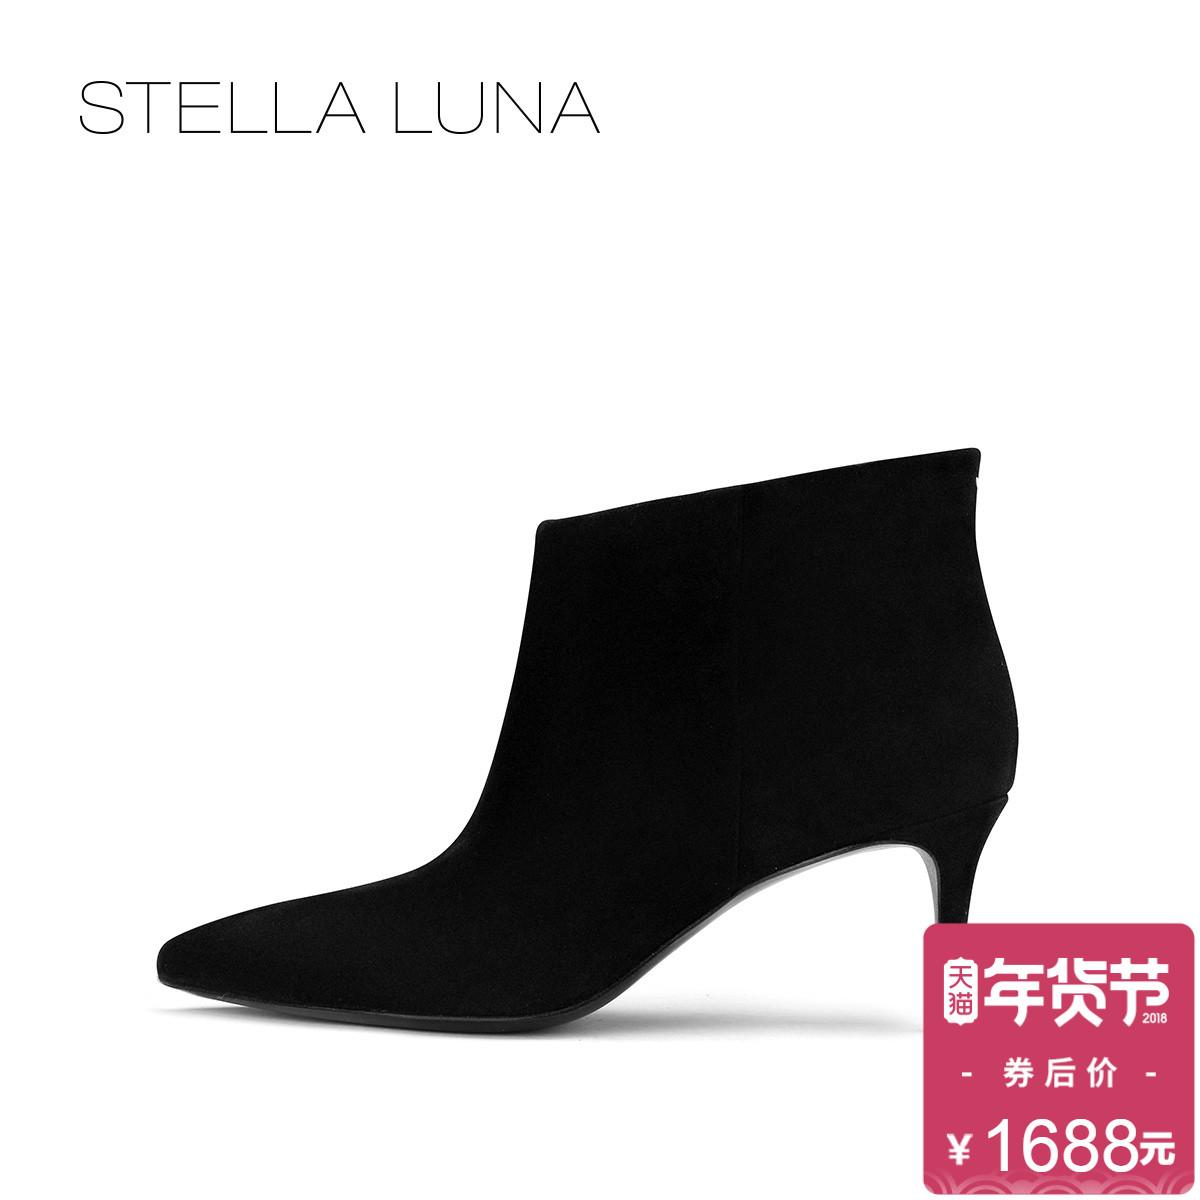 STELLA LUNA秋冬羊反毛尖头细高跟简约女士短靴 SG320L02047